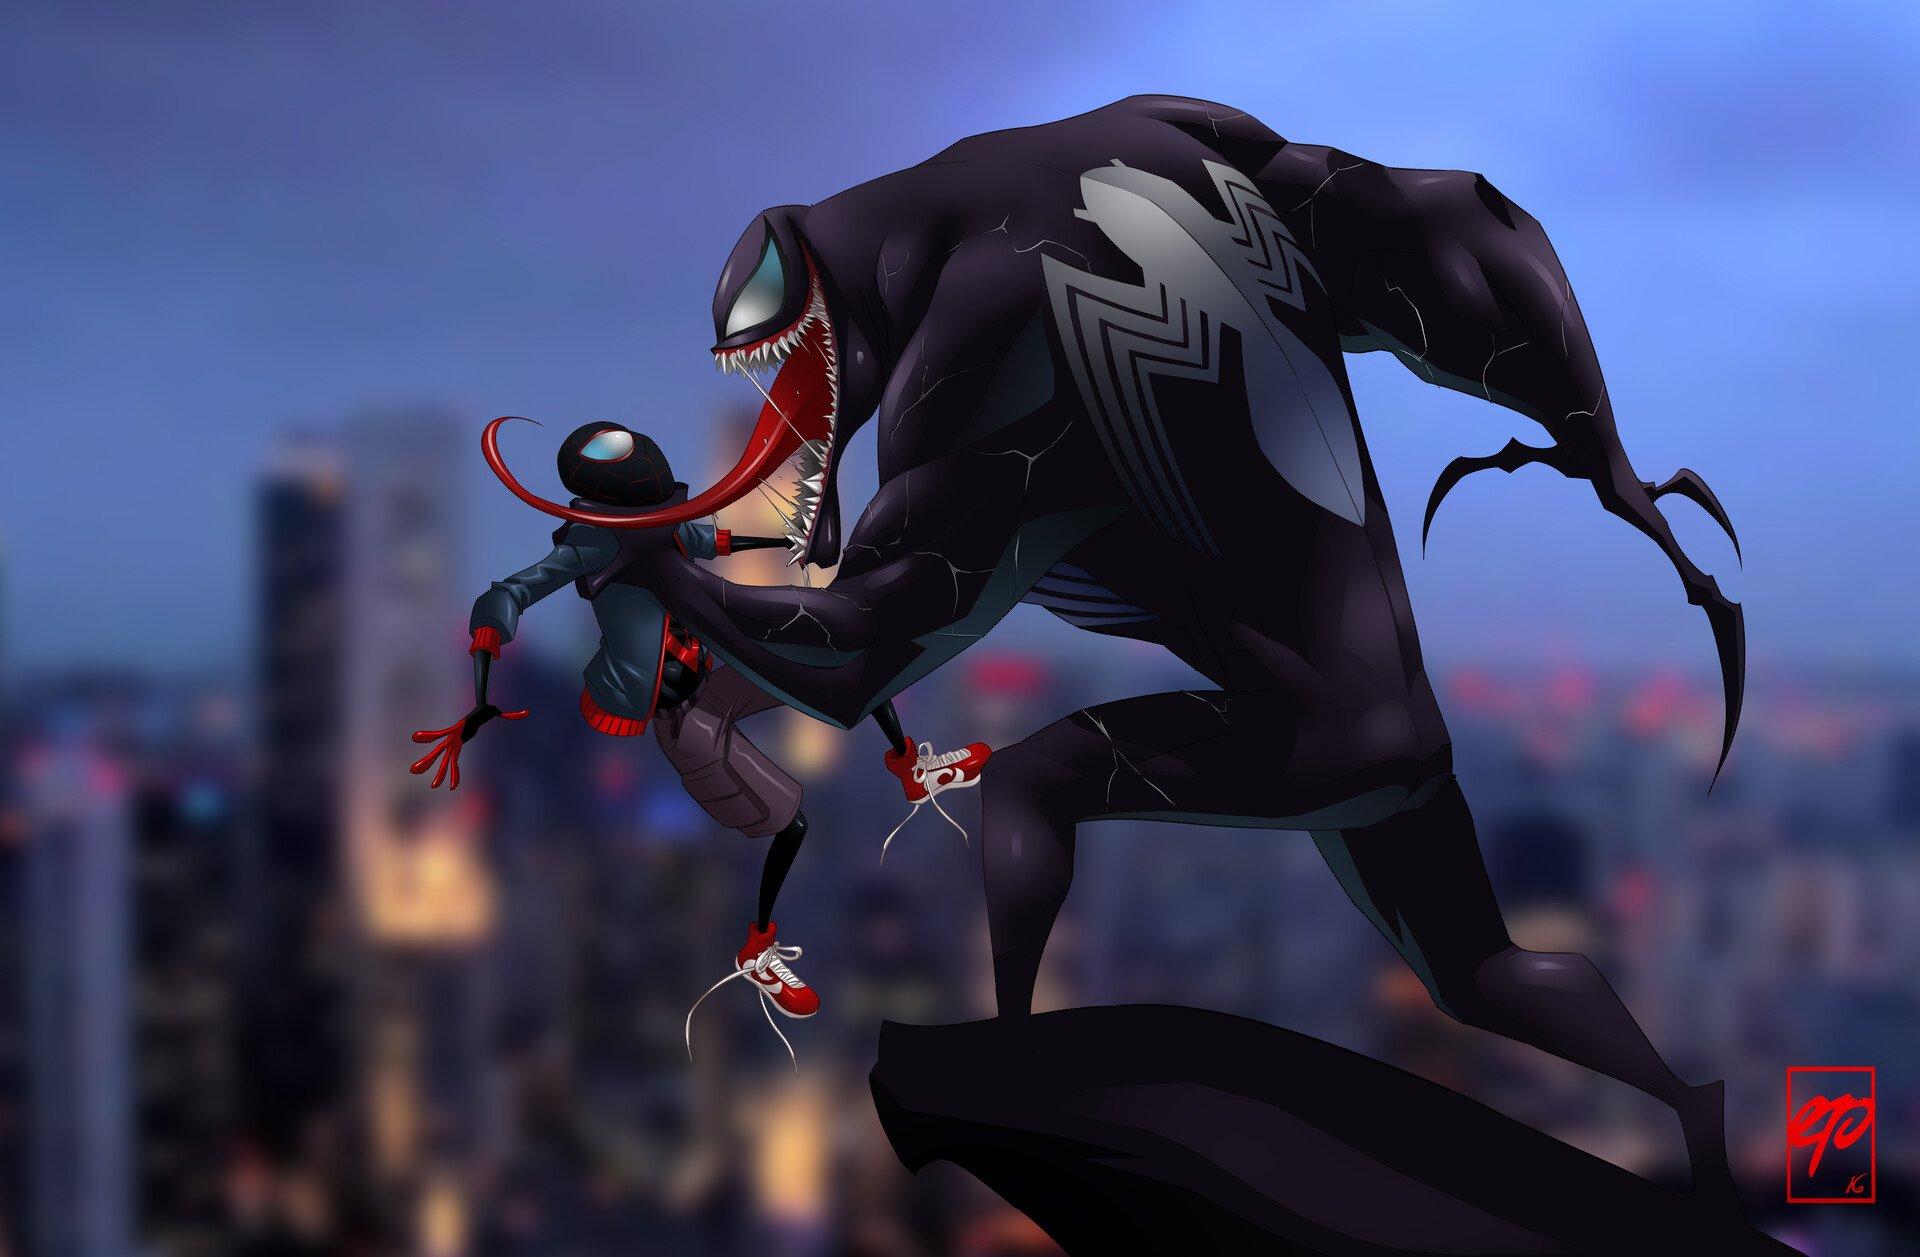 Spider-Man Fond d'écran HD | Arrière-Plan | 1920x1257 | ID:1049109 - Wallpaper Abyss